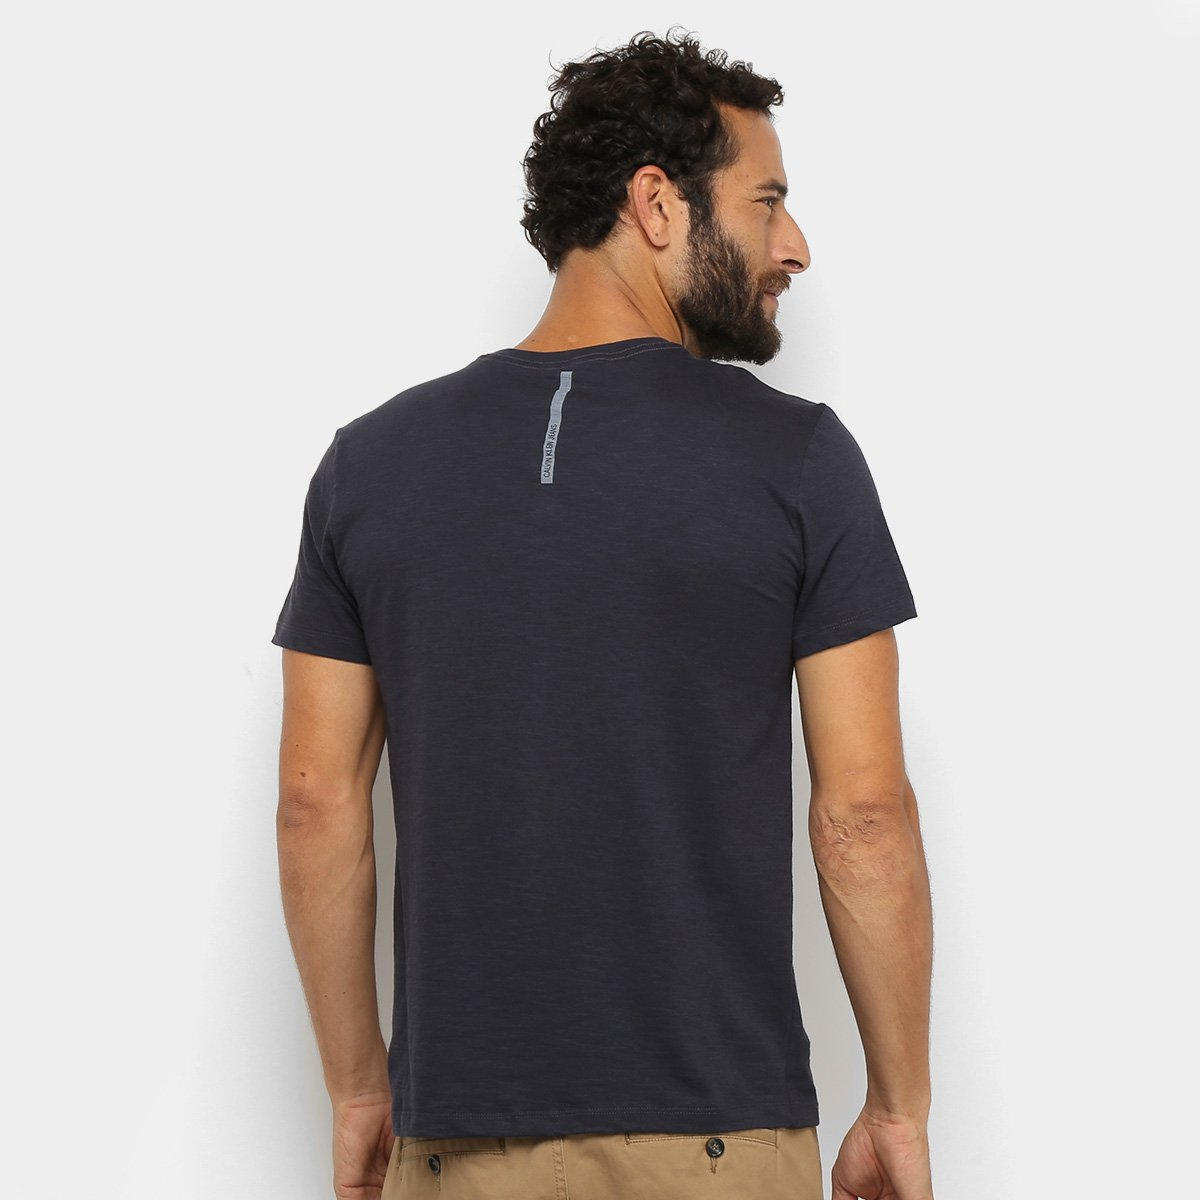 Camiseta Calvin Klein Re Issue Deslocado Masculina - Marinho